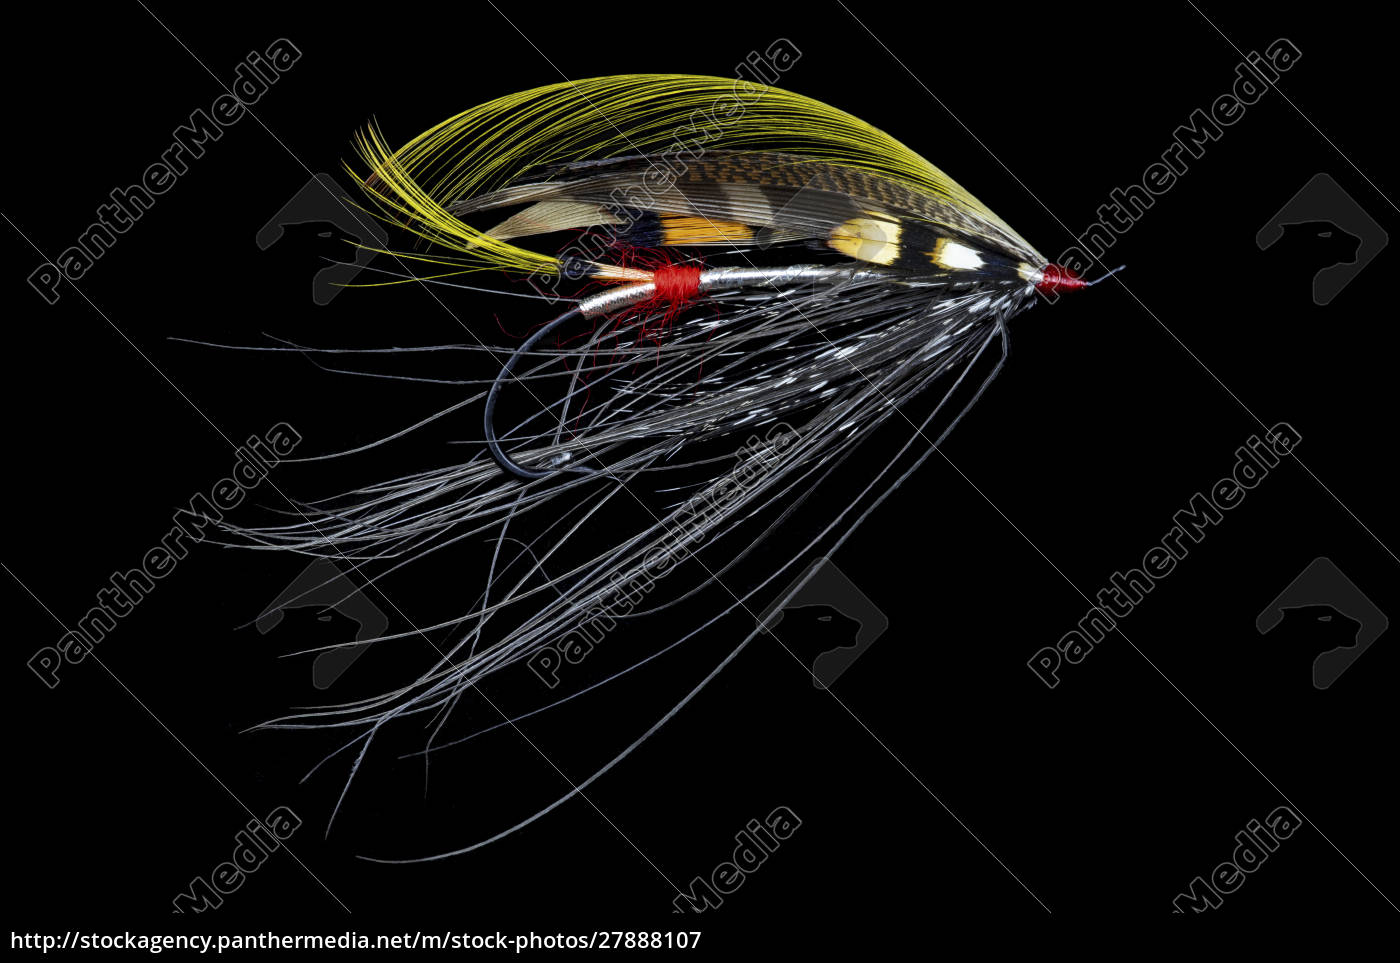 atlantic, salmon, fly, designs, 'pitcroy, fancy' - 27888107